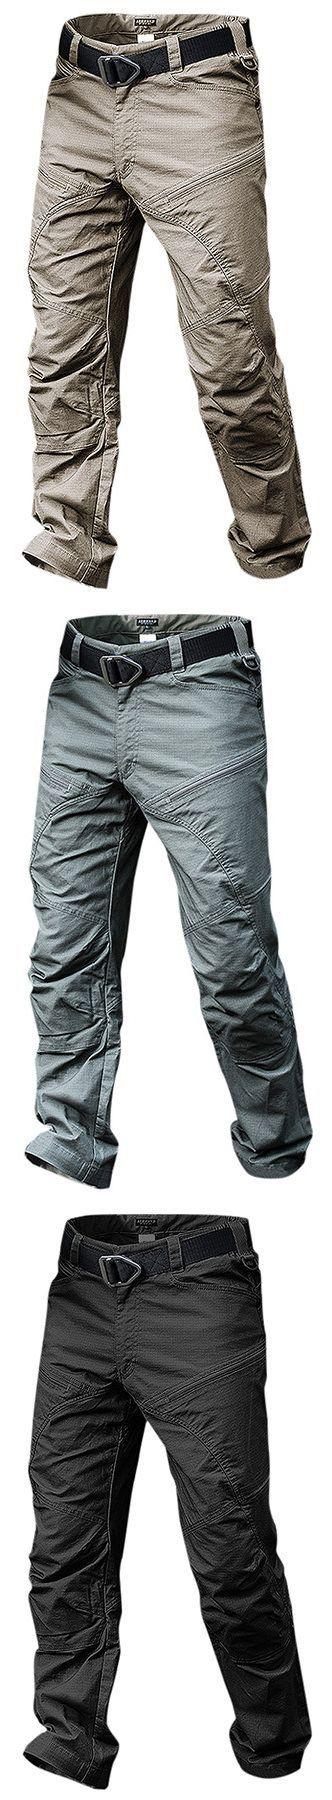 40 Ideas De Pantalones De Hombre Moda Pantalones De Hombre Moda Pantalones De Hombre Moda Hombre